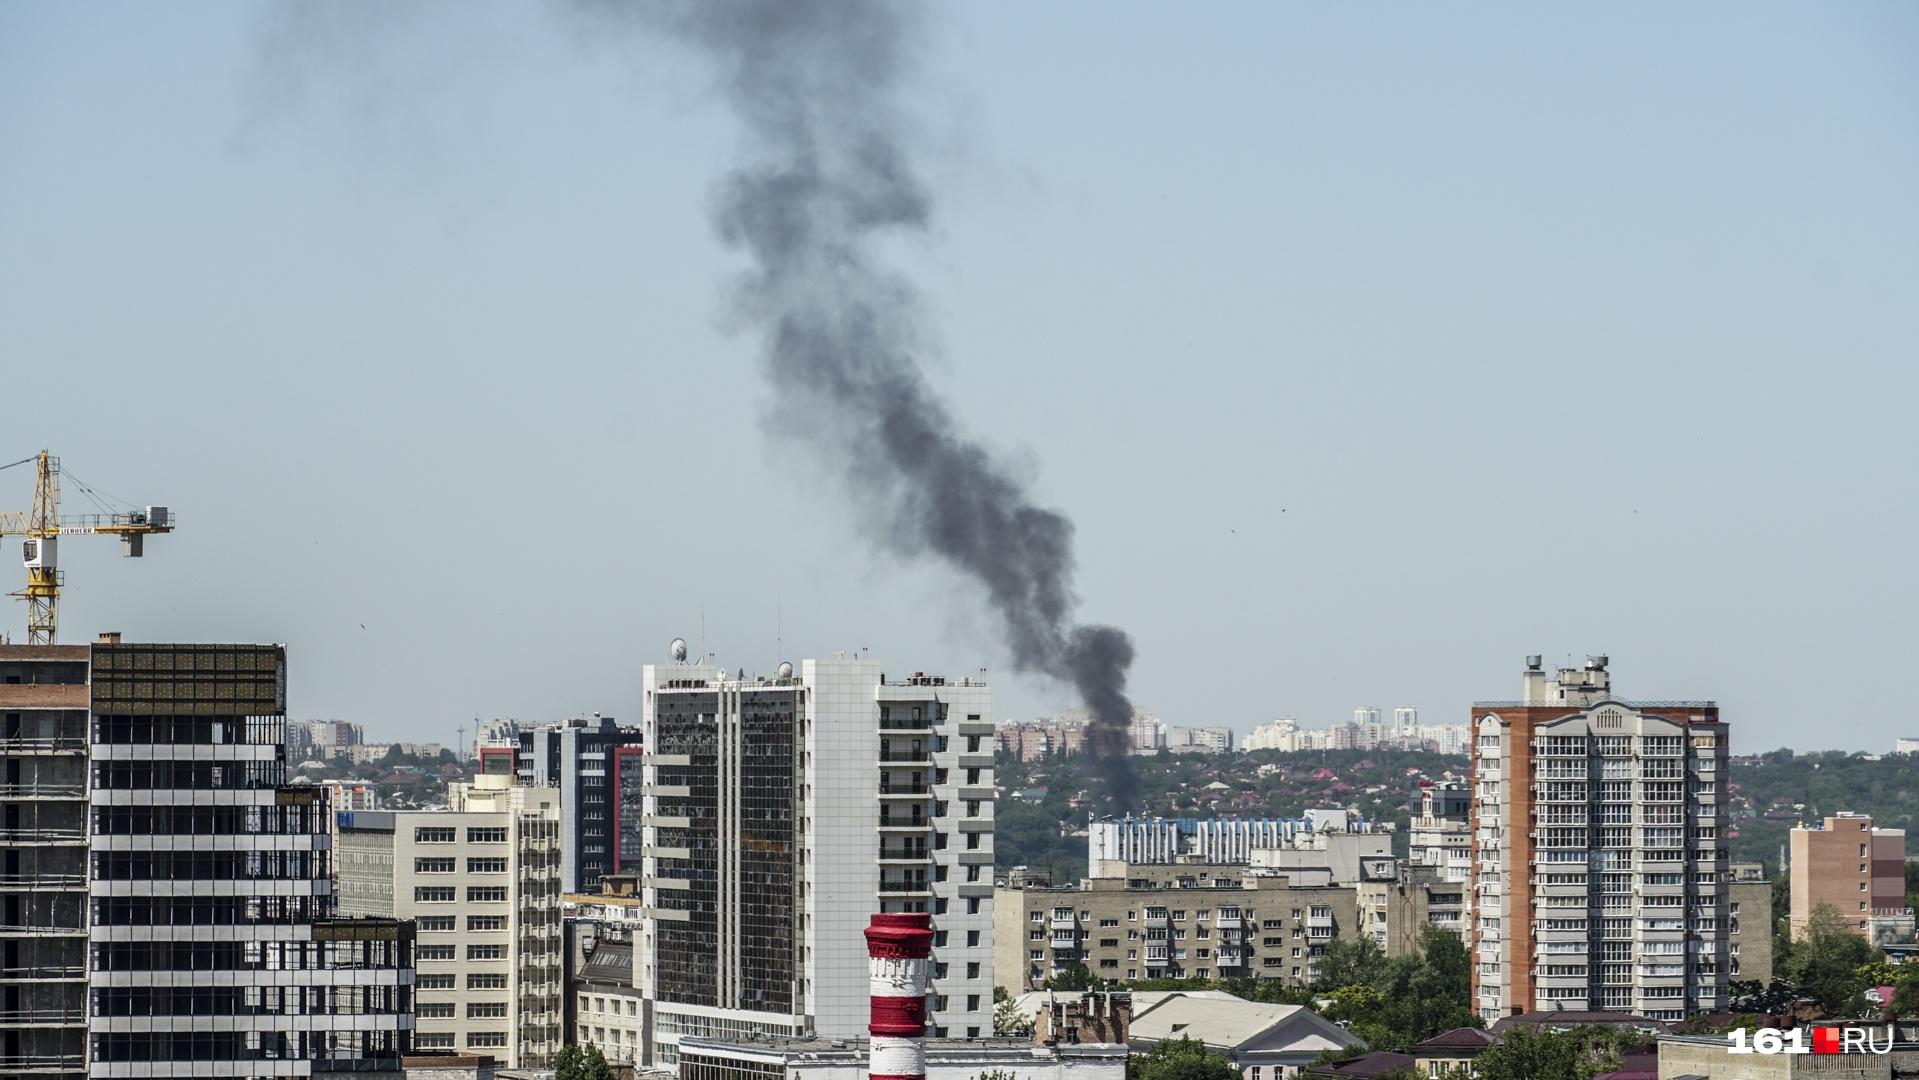 Столб дыма был заметен с другого конца города